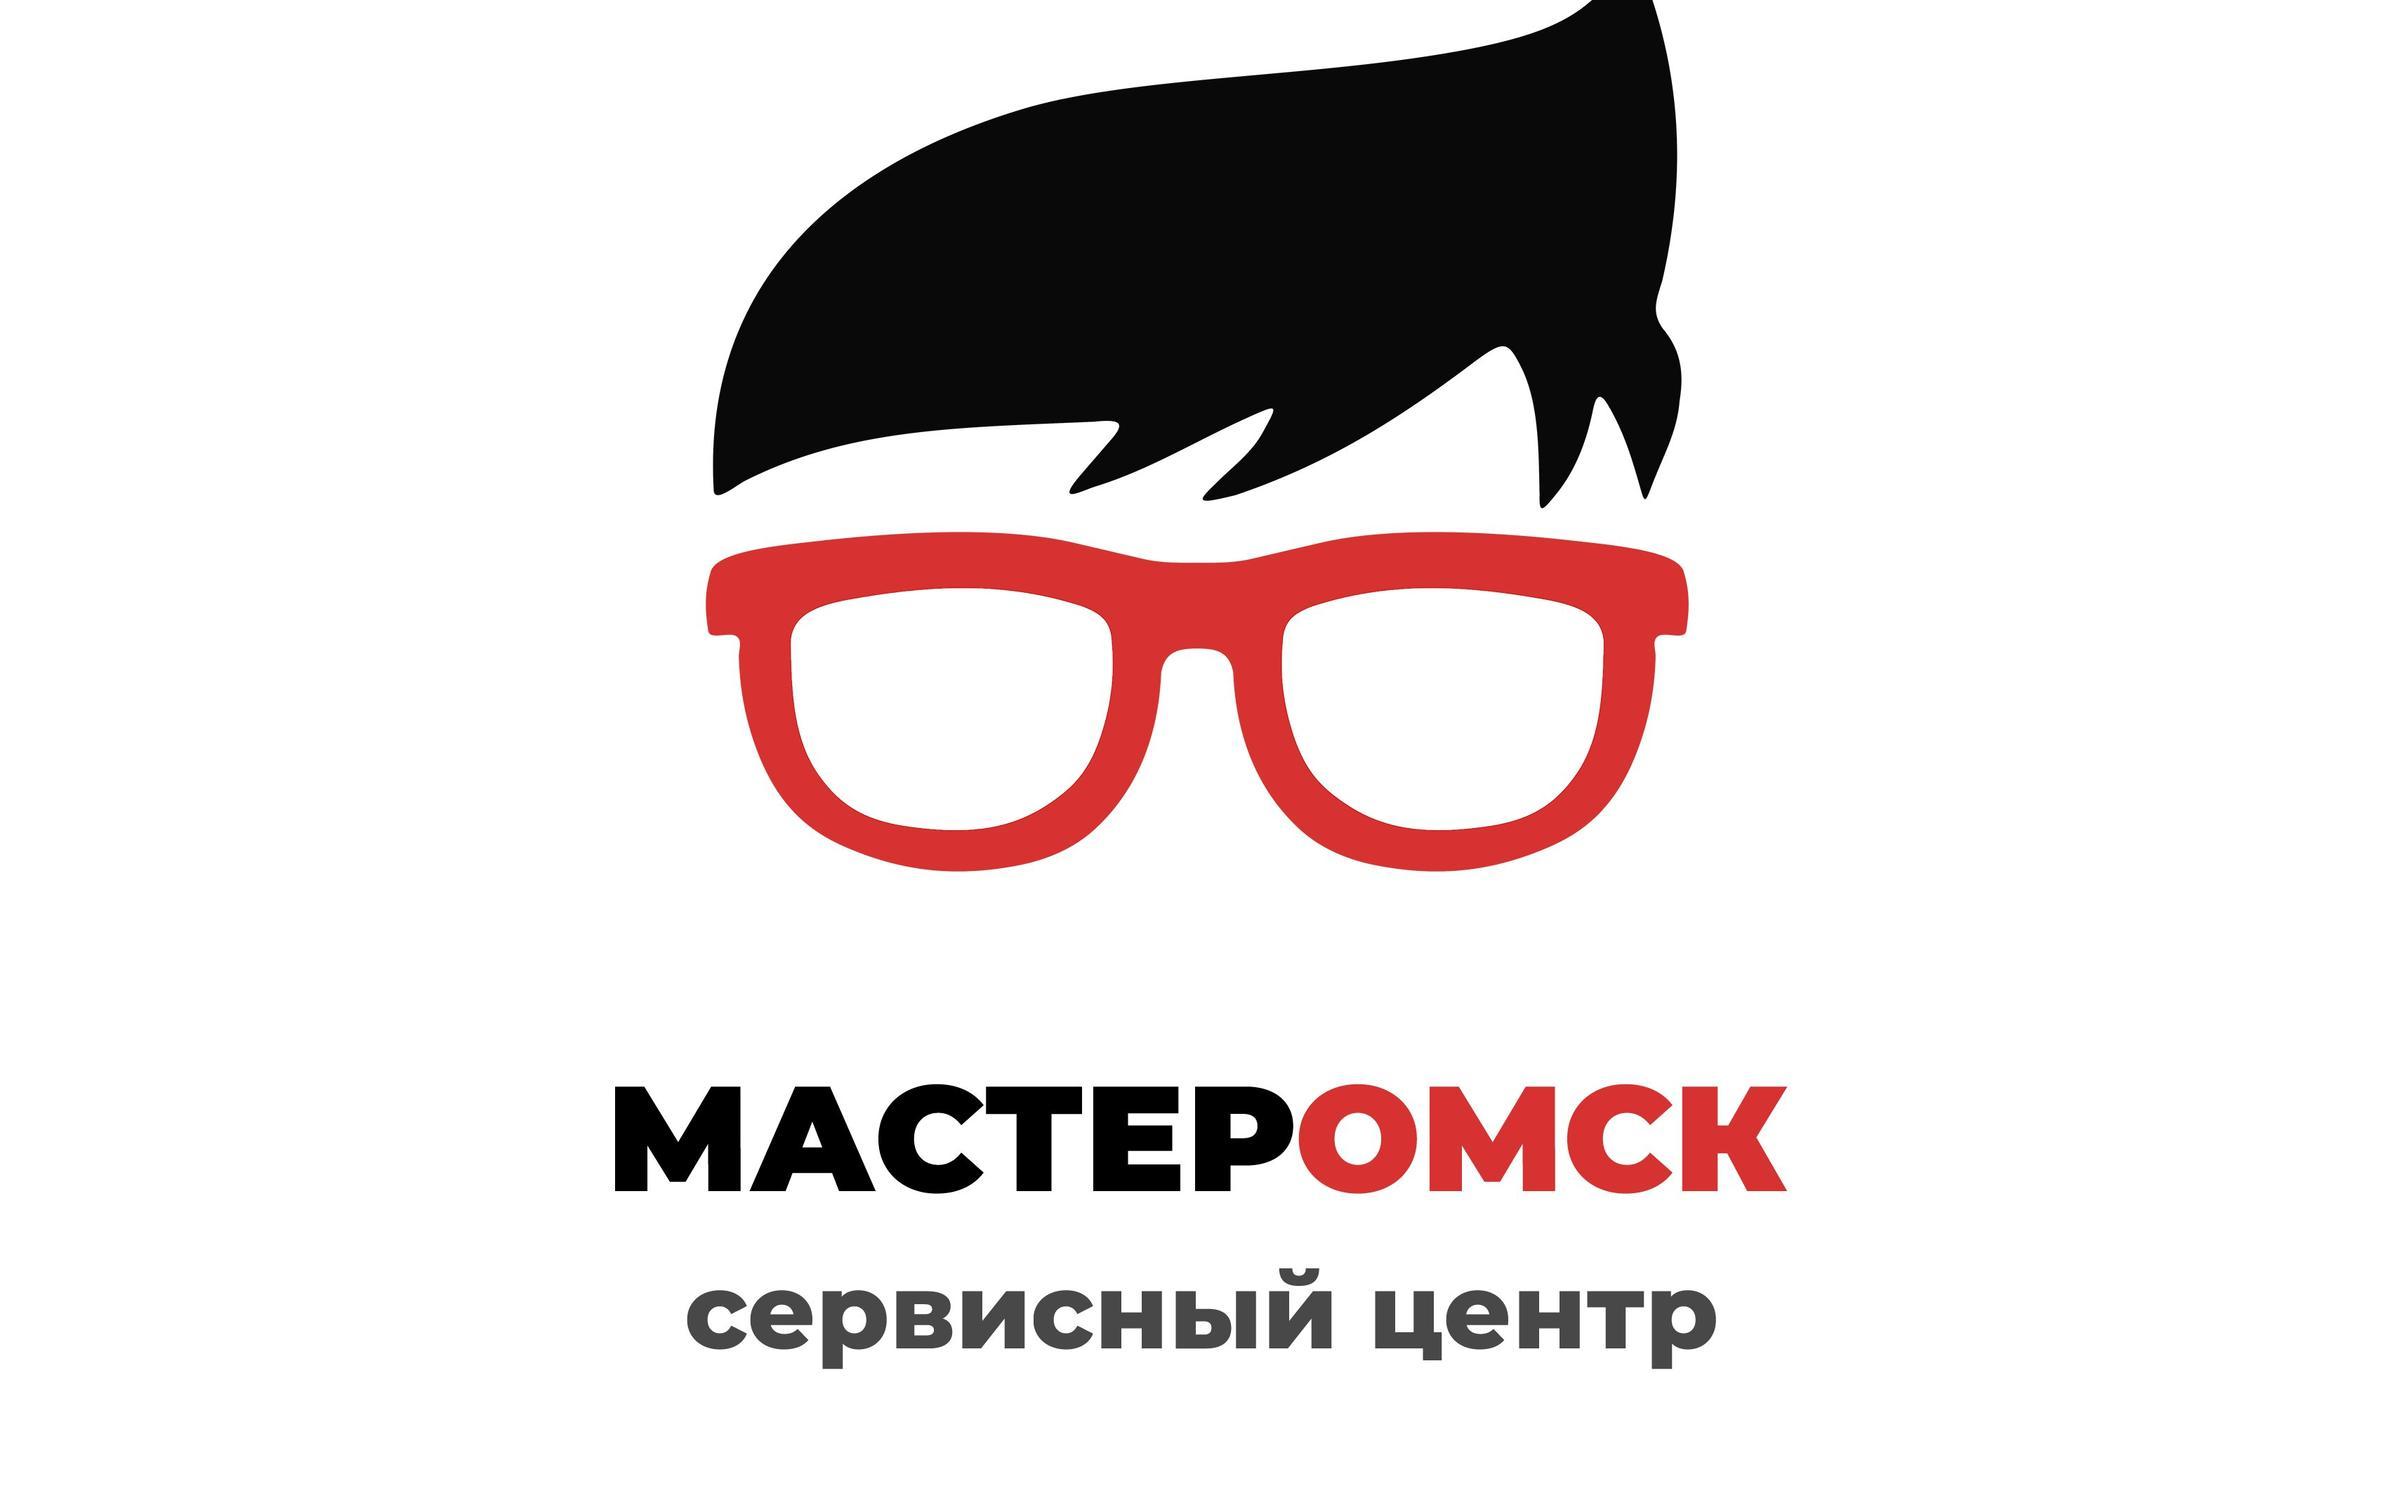 фотография Сервисного центра Мастер Омск на улице 5-й Армии, 6